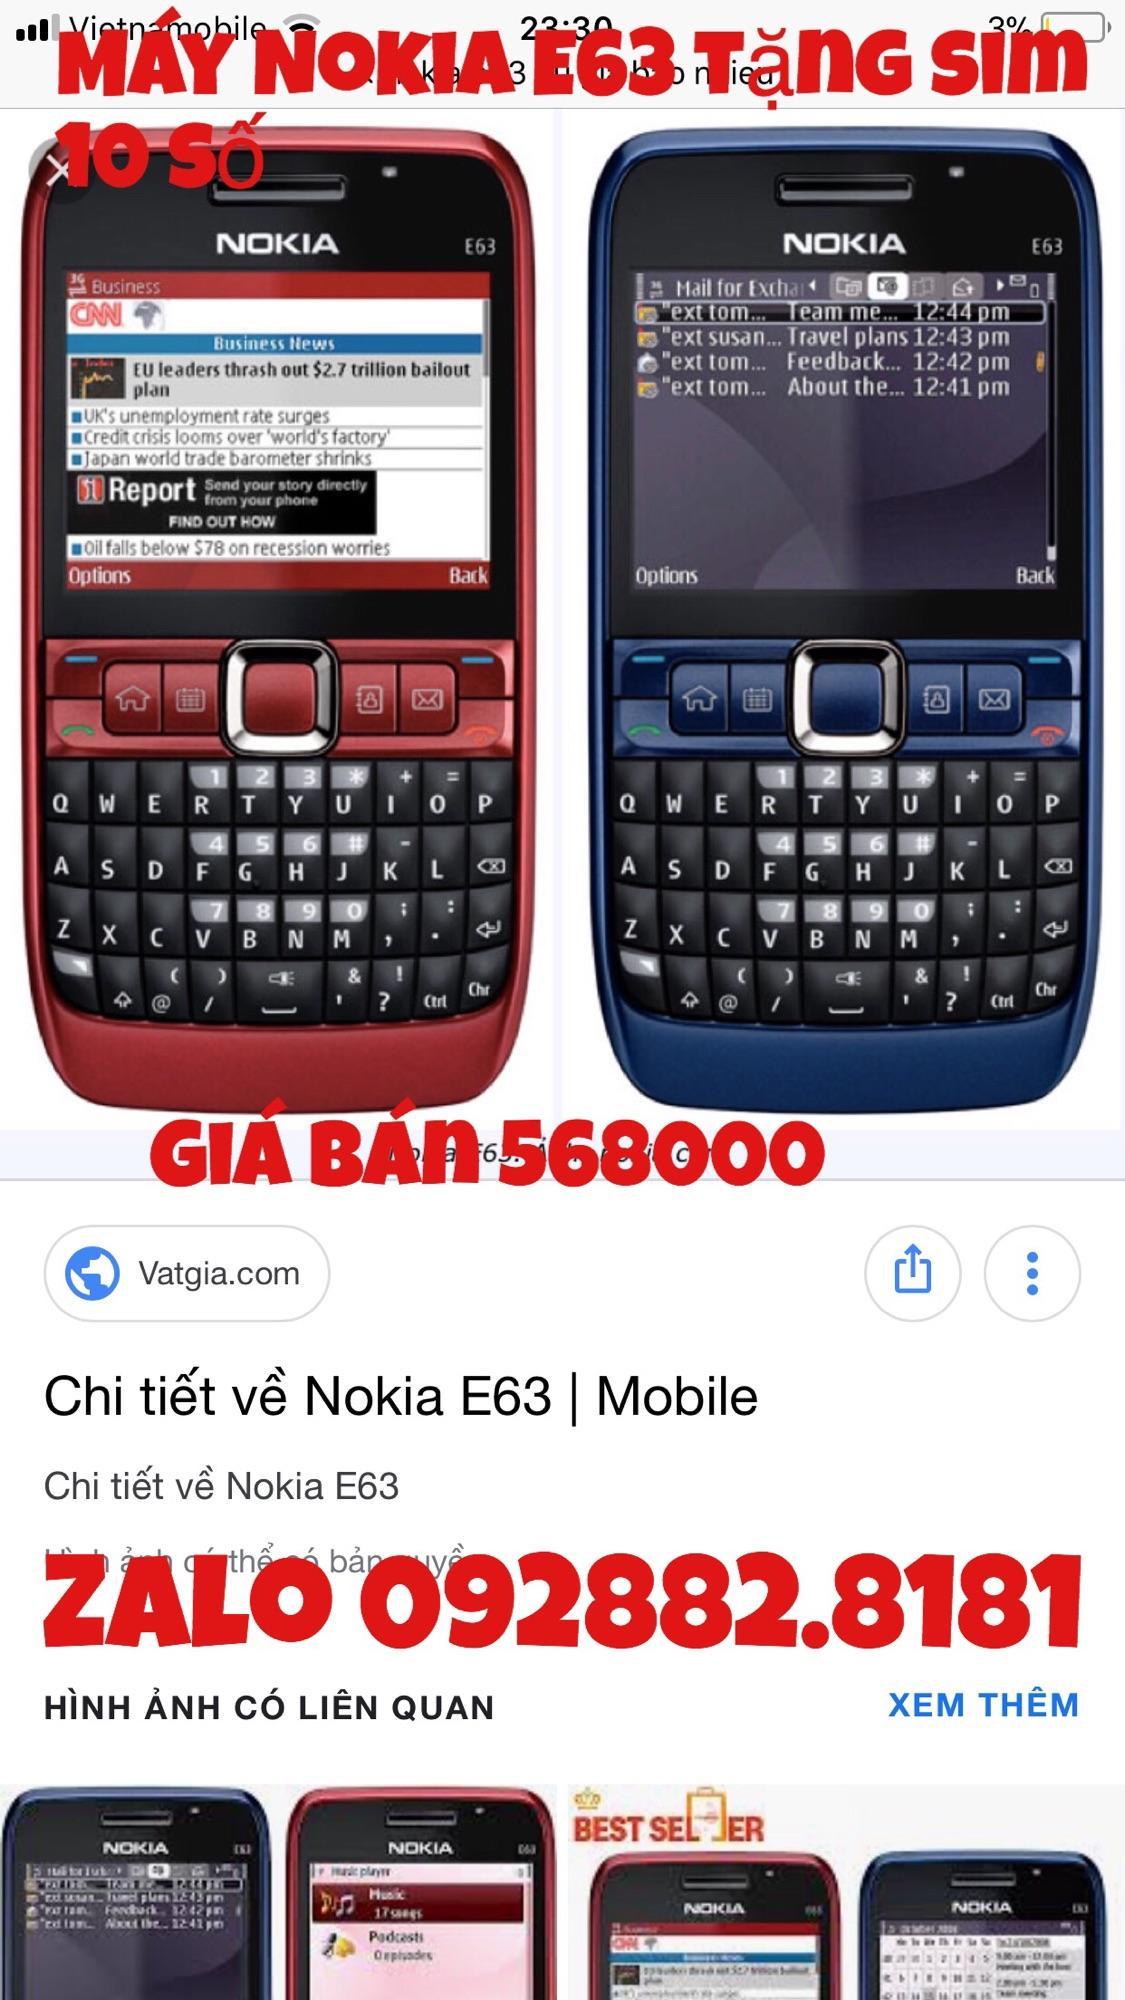 Mua Nokia E63 Zin Tặng Sim 10 Số Trực Tuyến Rẻ